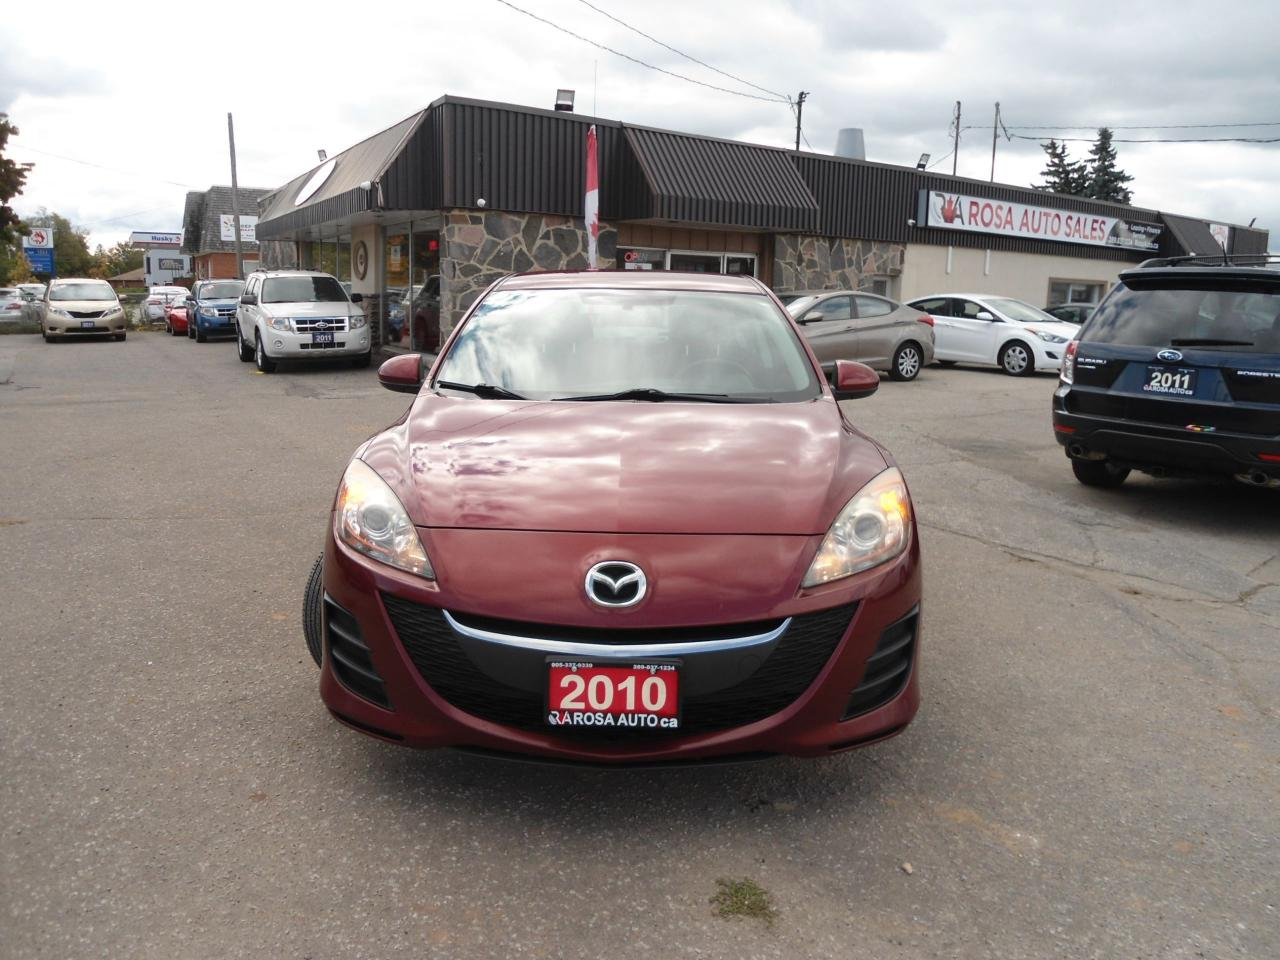 2010 Mazda MAZDA3 AUTO, AUX,CD,AC,  4 CYLINDER ,5 PASSENGERS, NO RUS